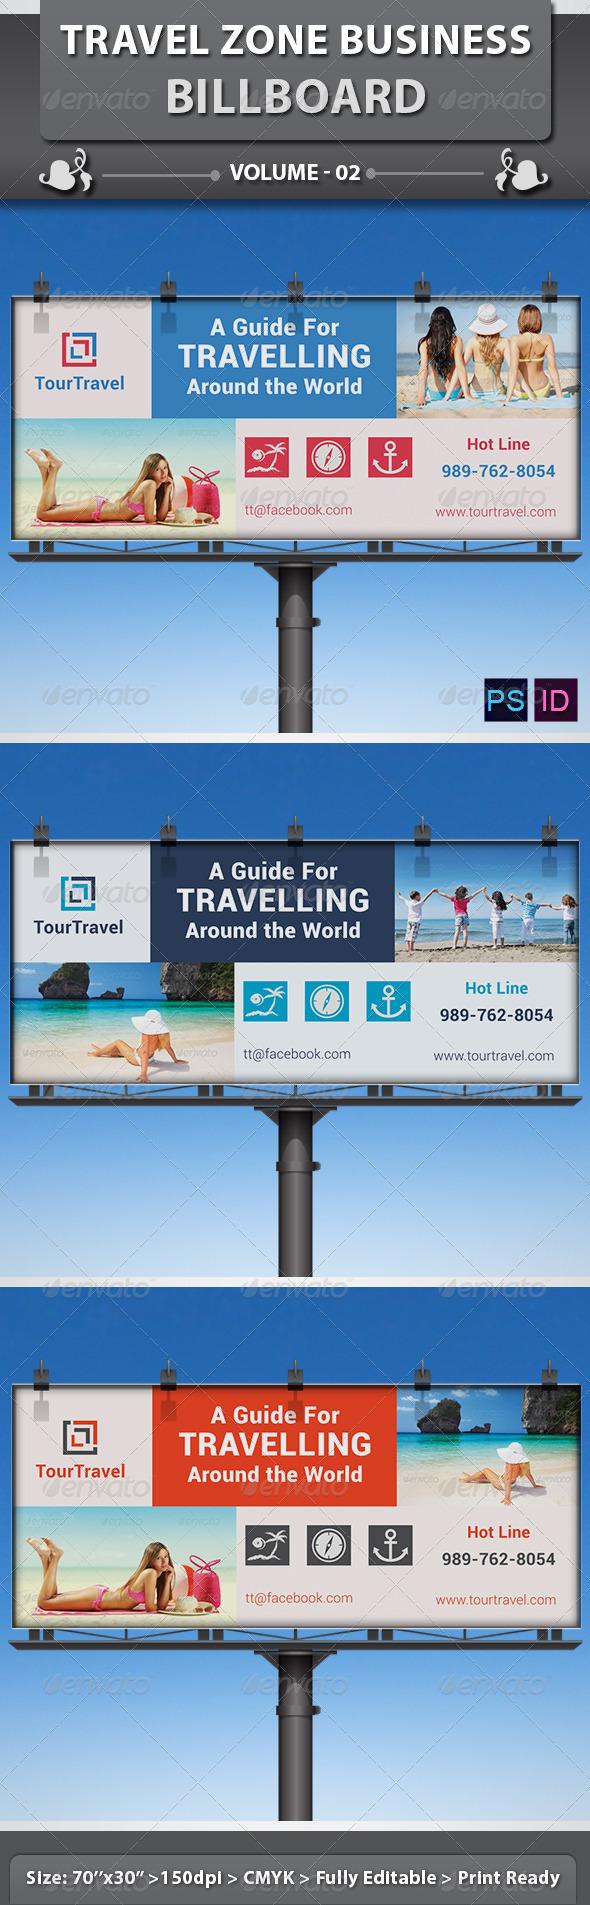 GraphicRiver Travel Zone Business Billboard v2 6415830